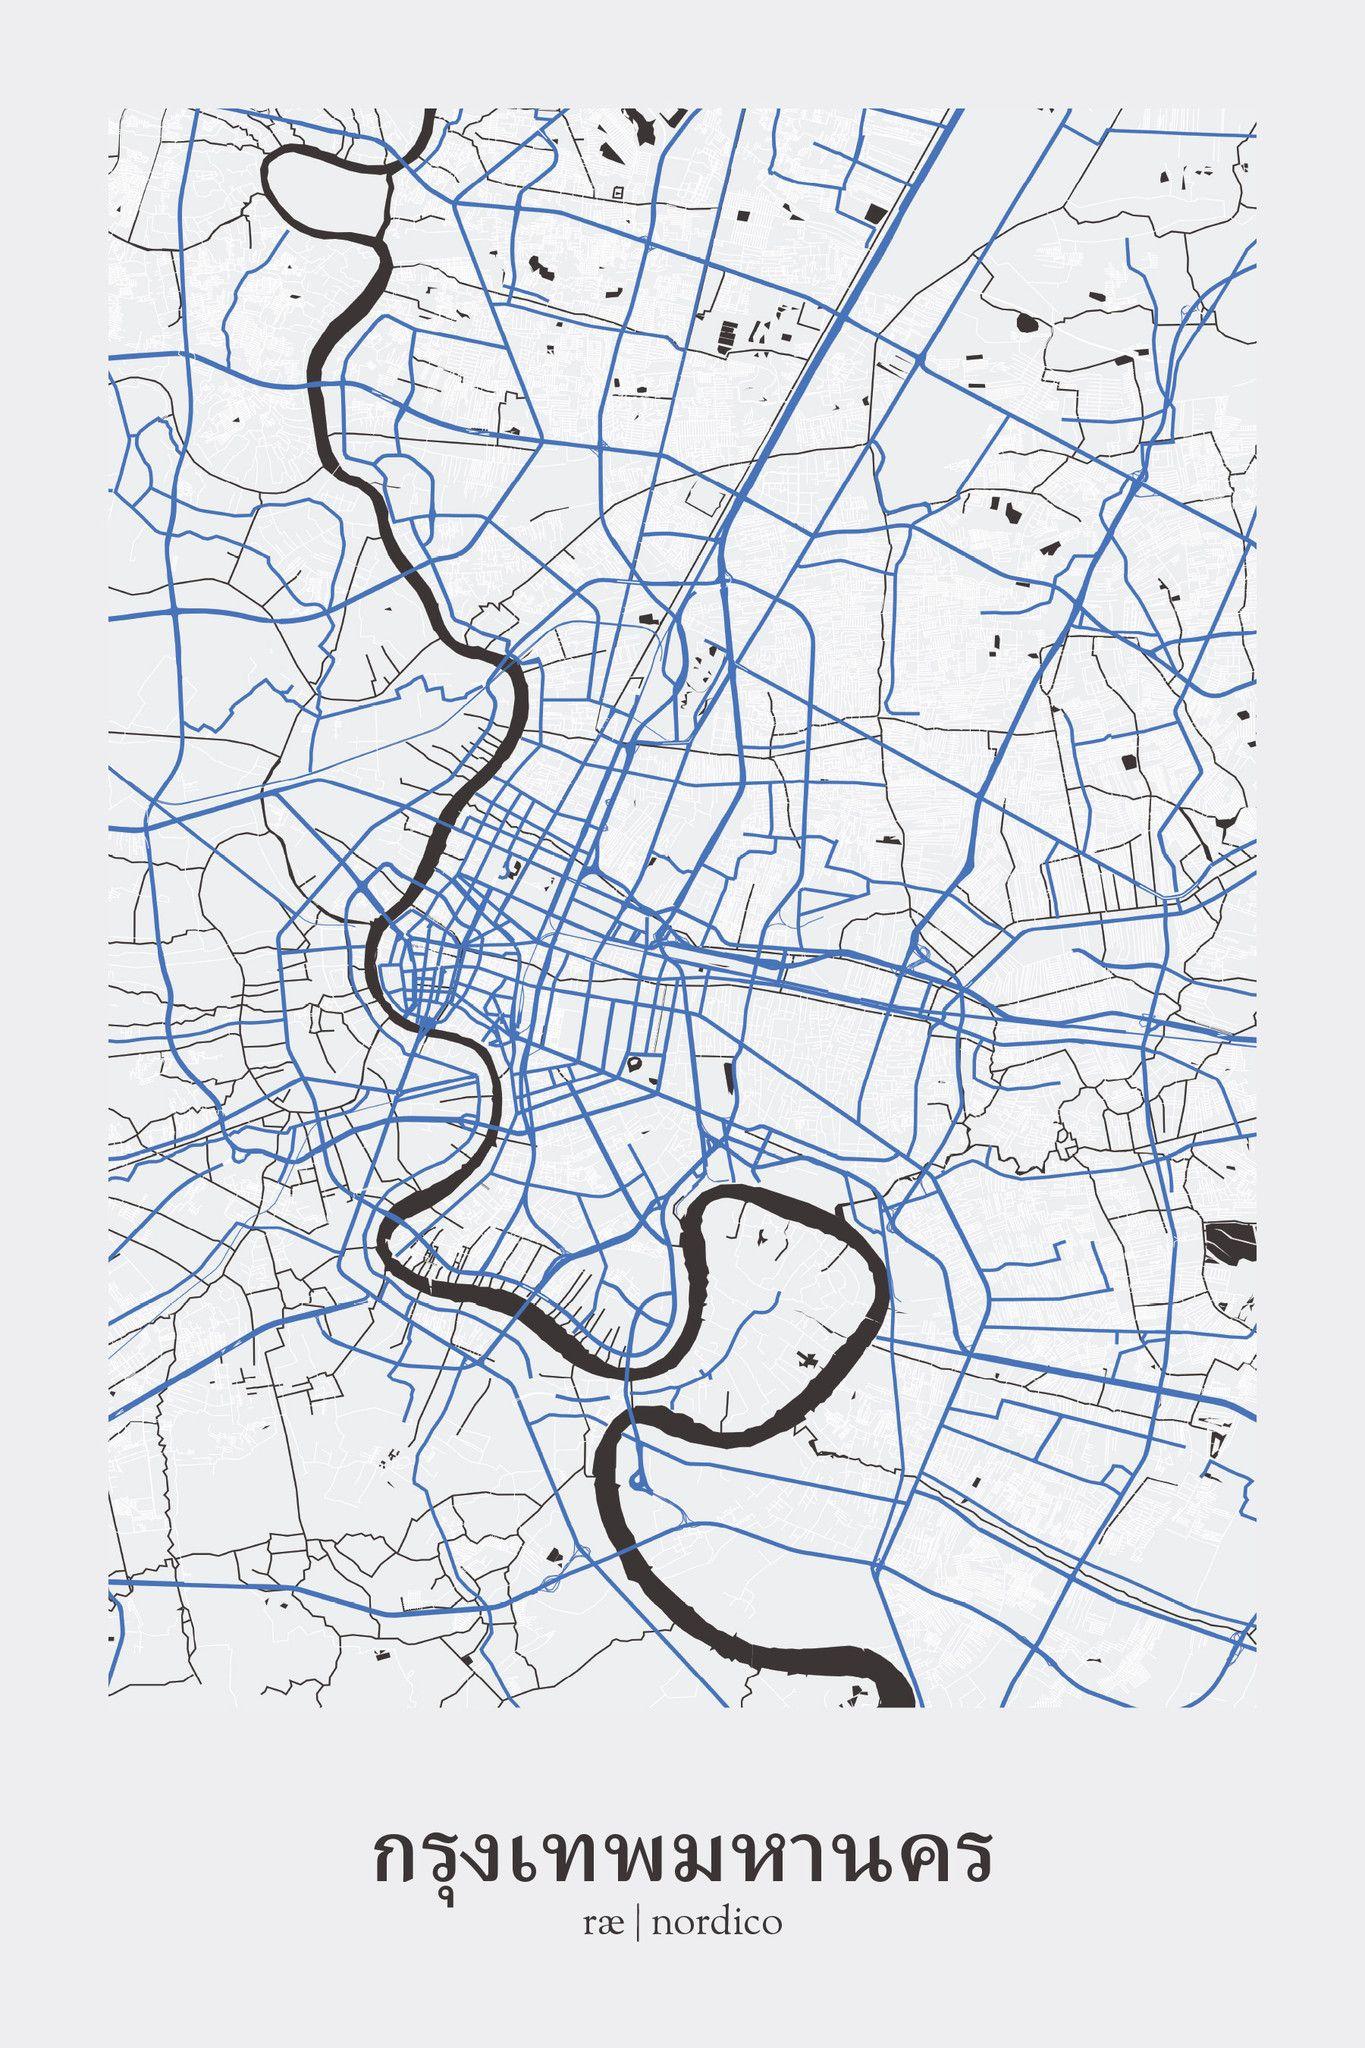 Bangkok Map Print City Maps Pinterest Bangkok And City Maps - Map of thailand cities